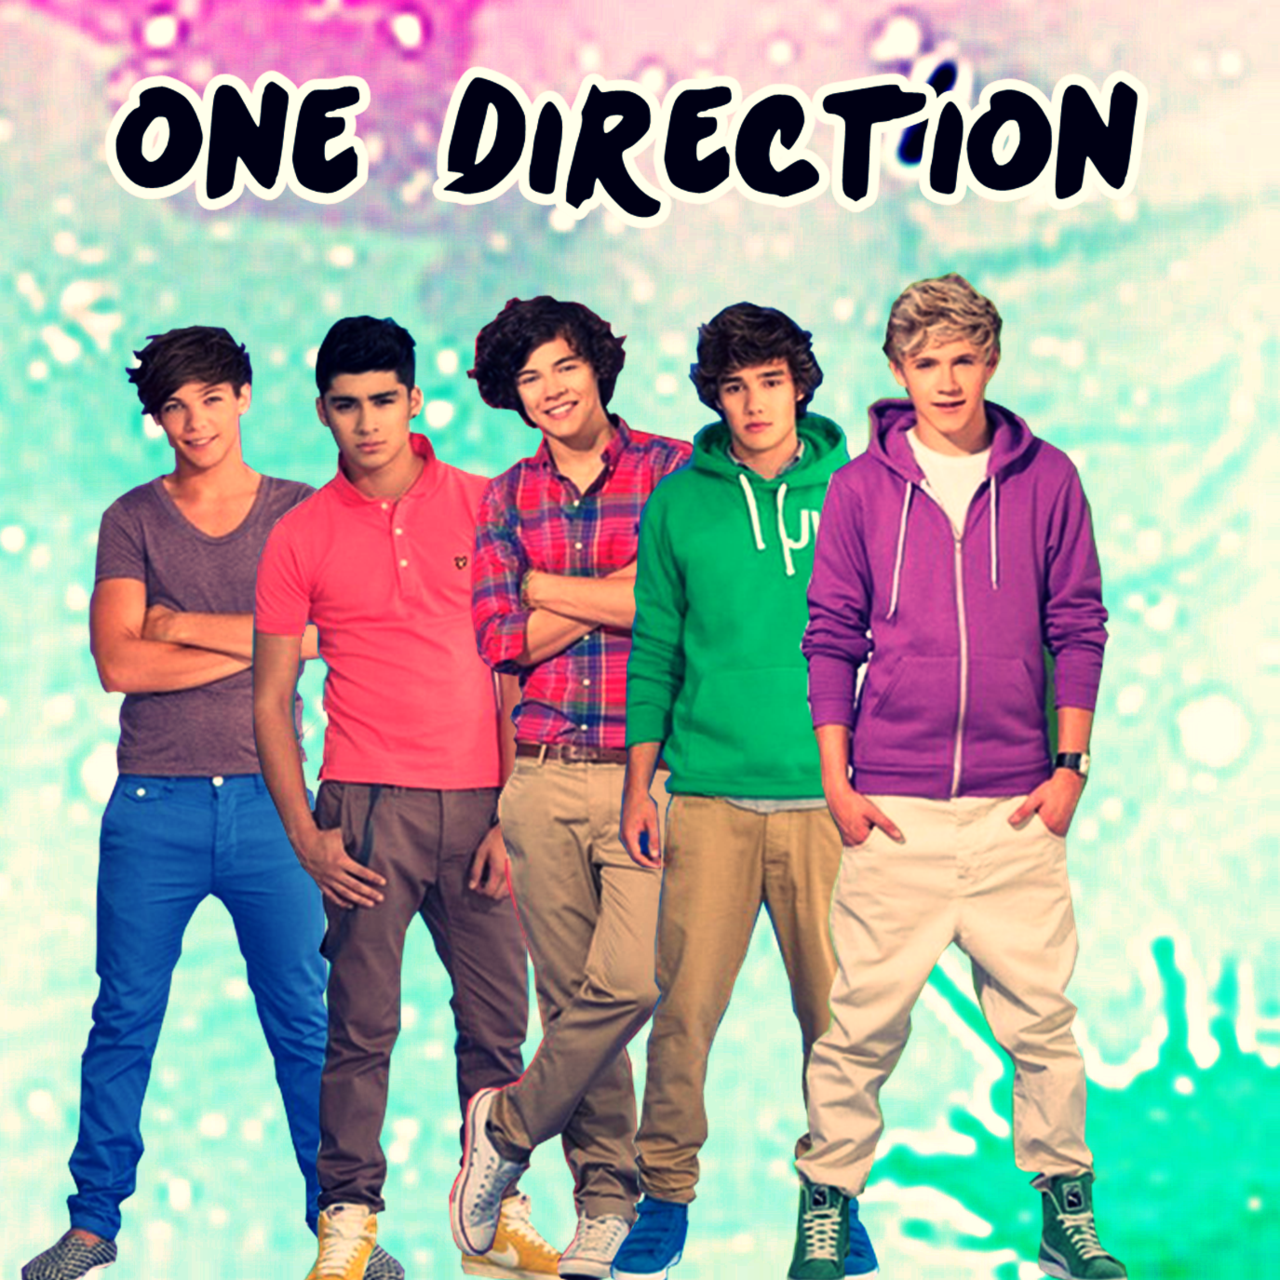 One Direction Wallpaper Photos Album Music 21476 Wallpaper 1280x1280